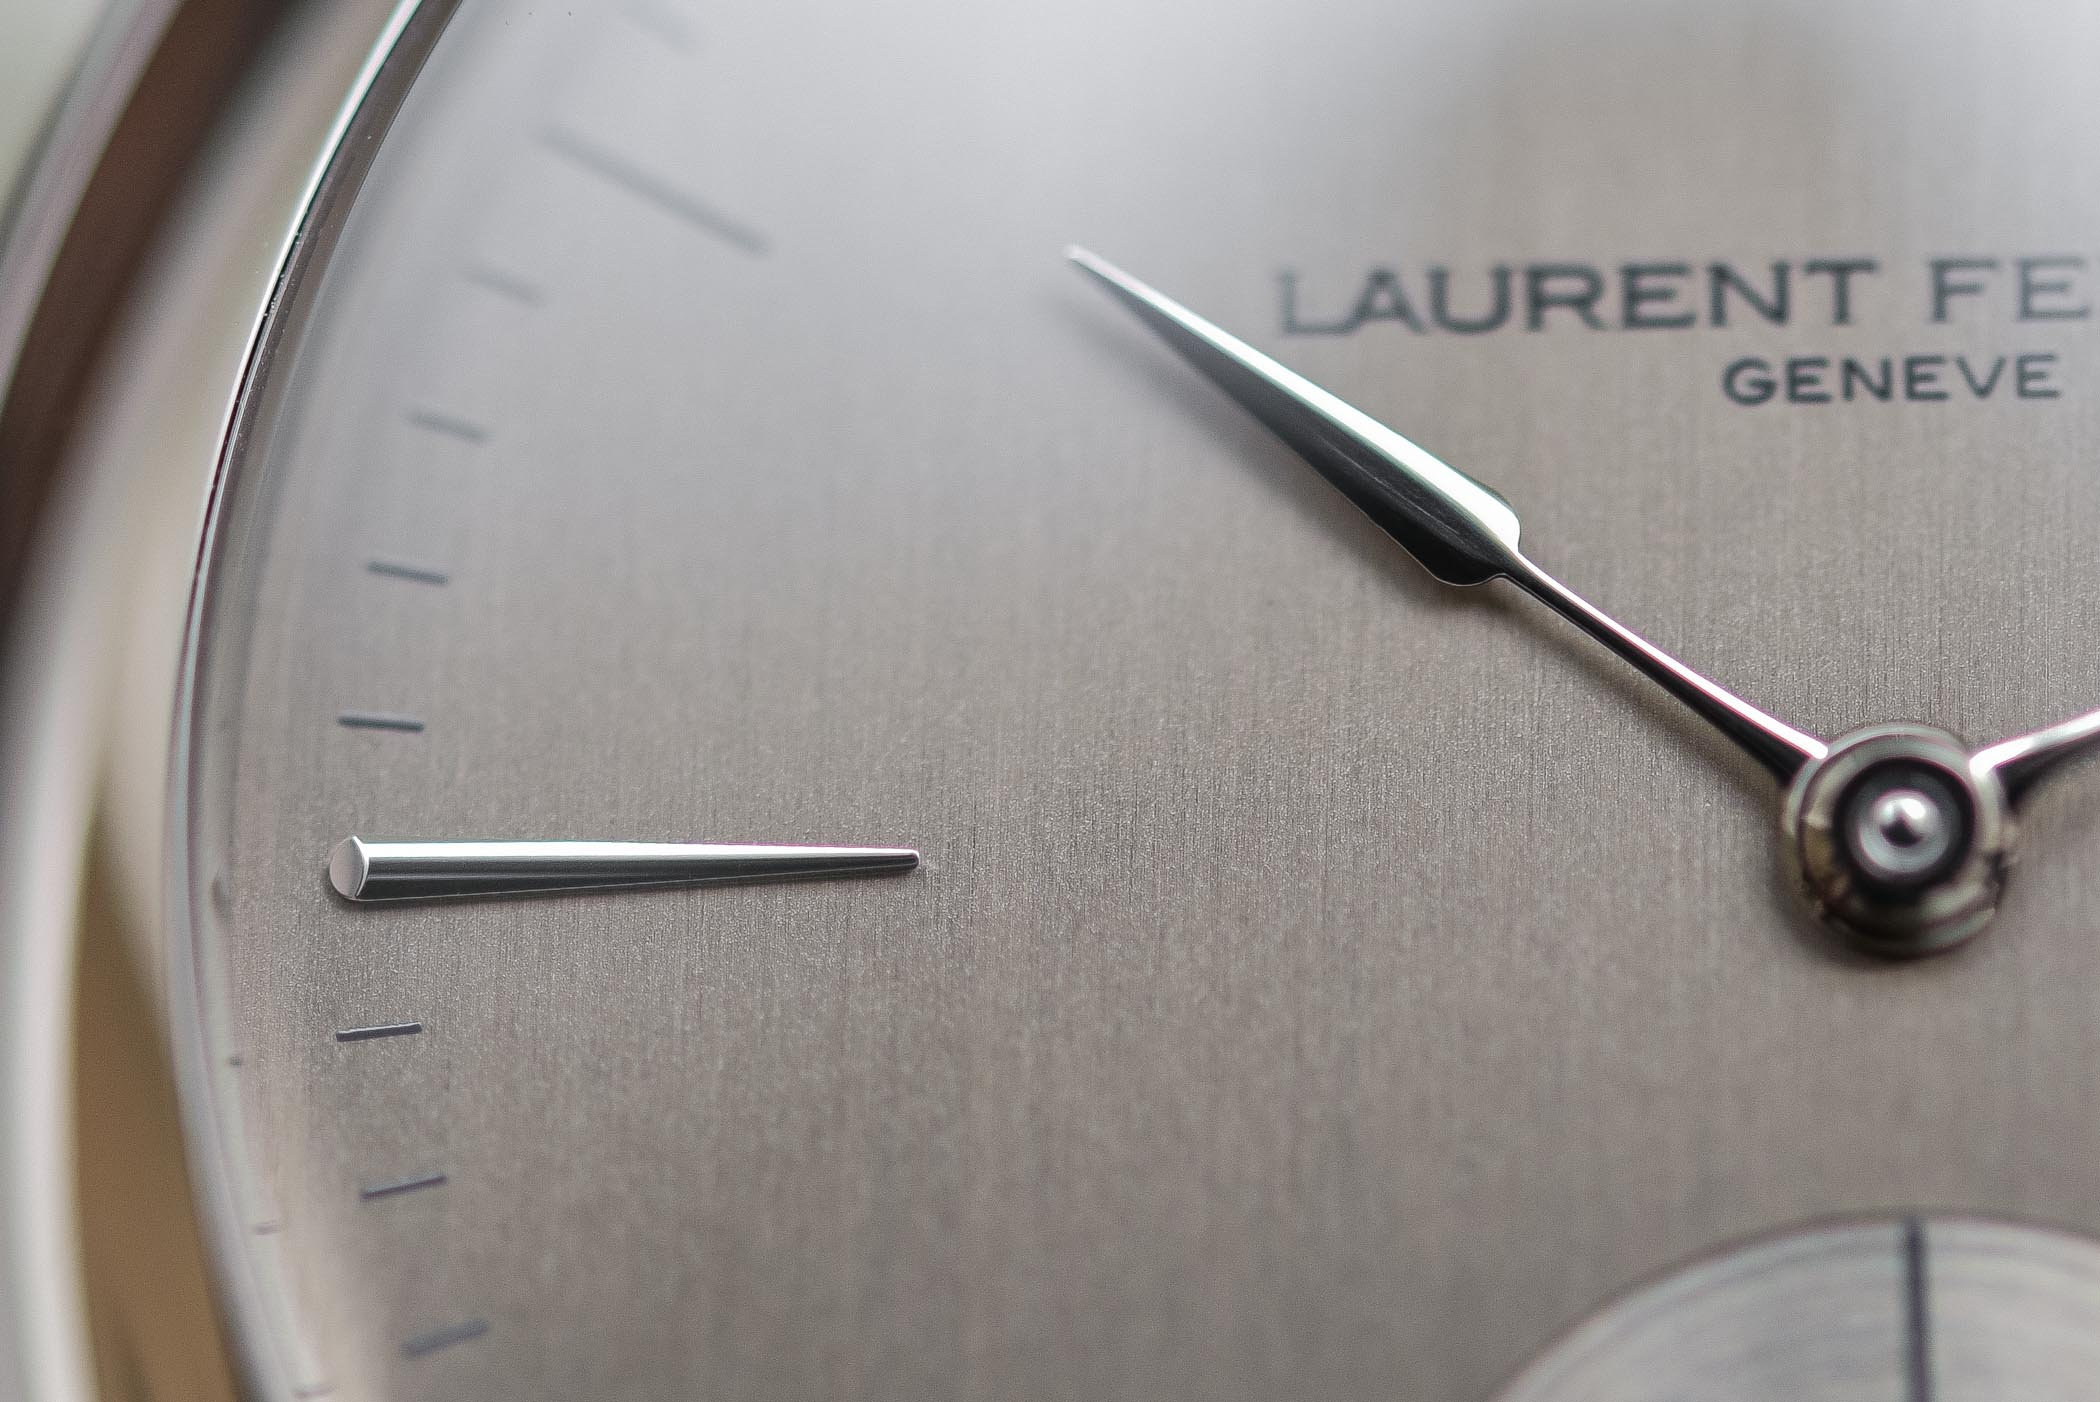 Laurent Ferrier Montre Ecole Steel - Review